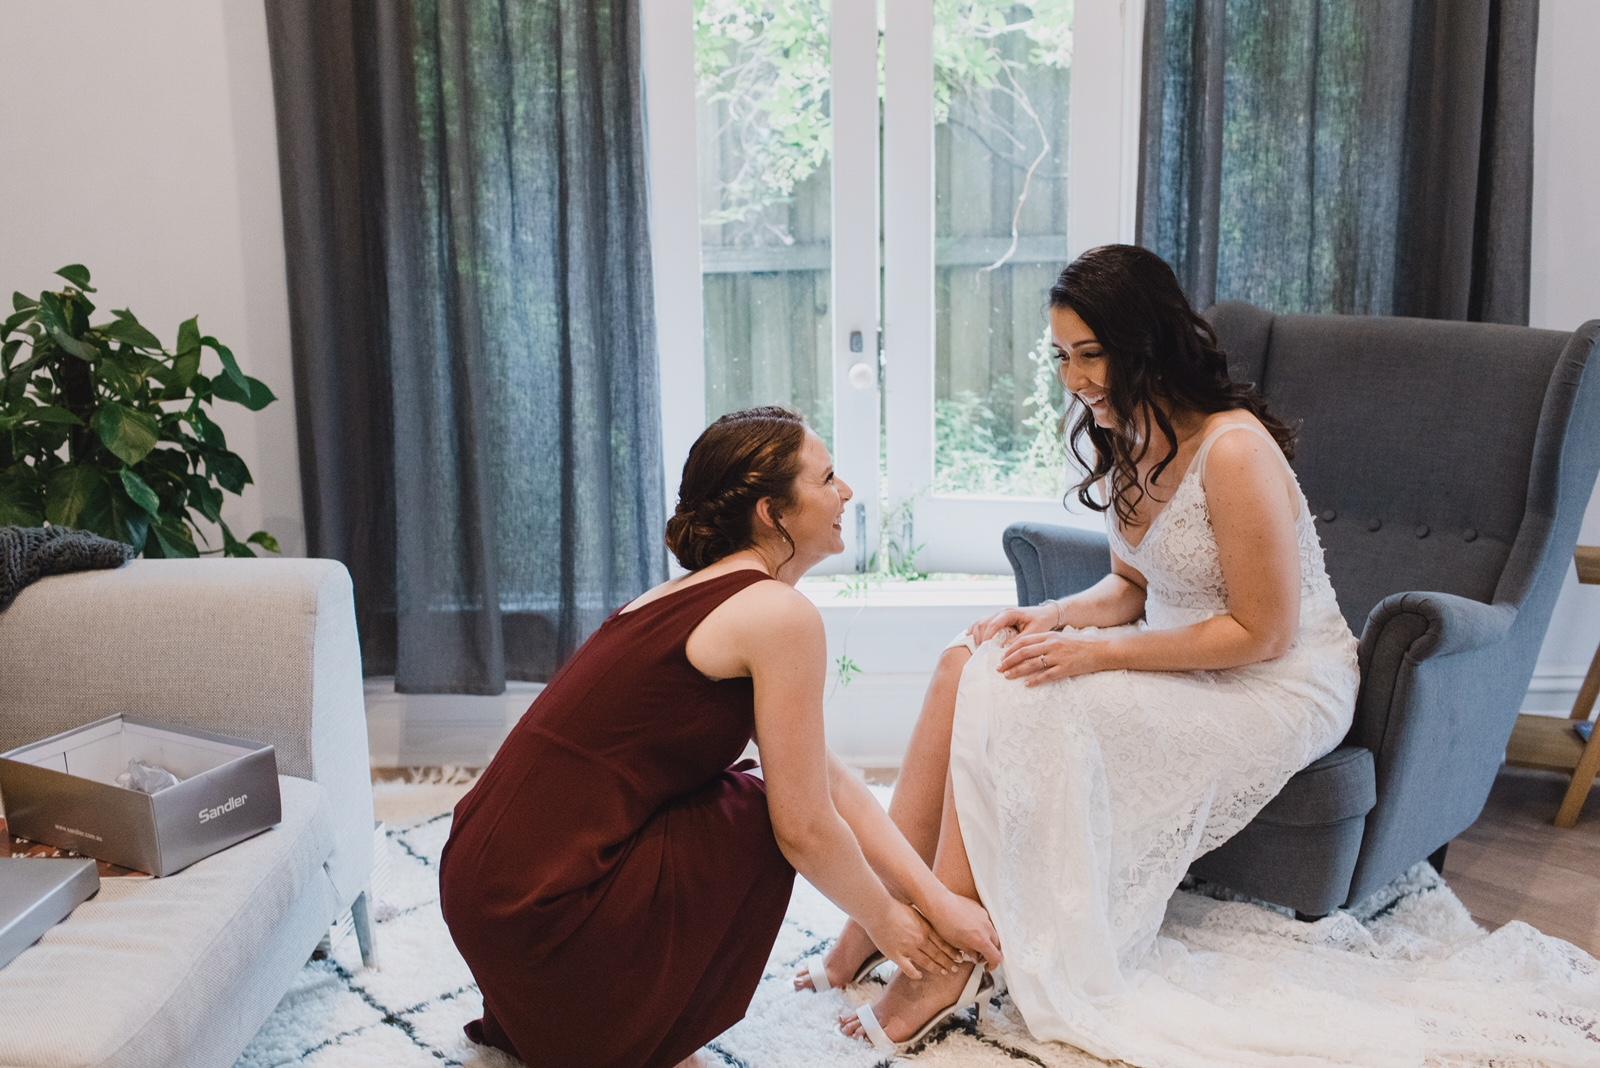 Me helping Lisa put on her bridal shoes, December 2018.